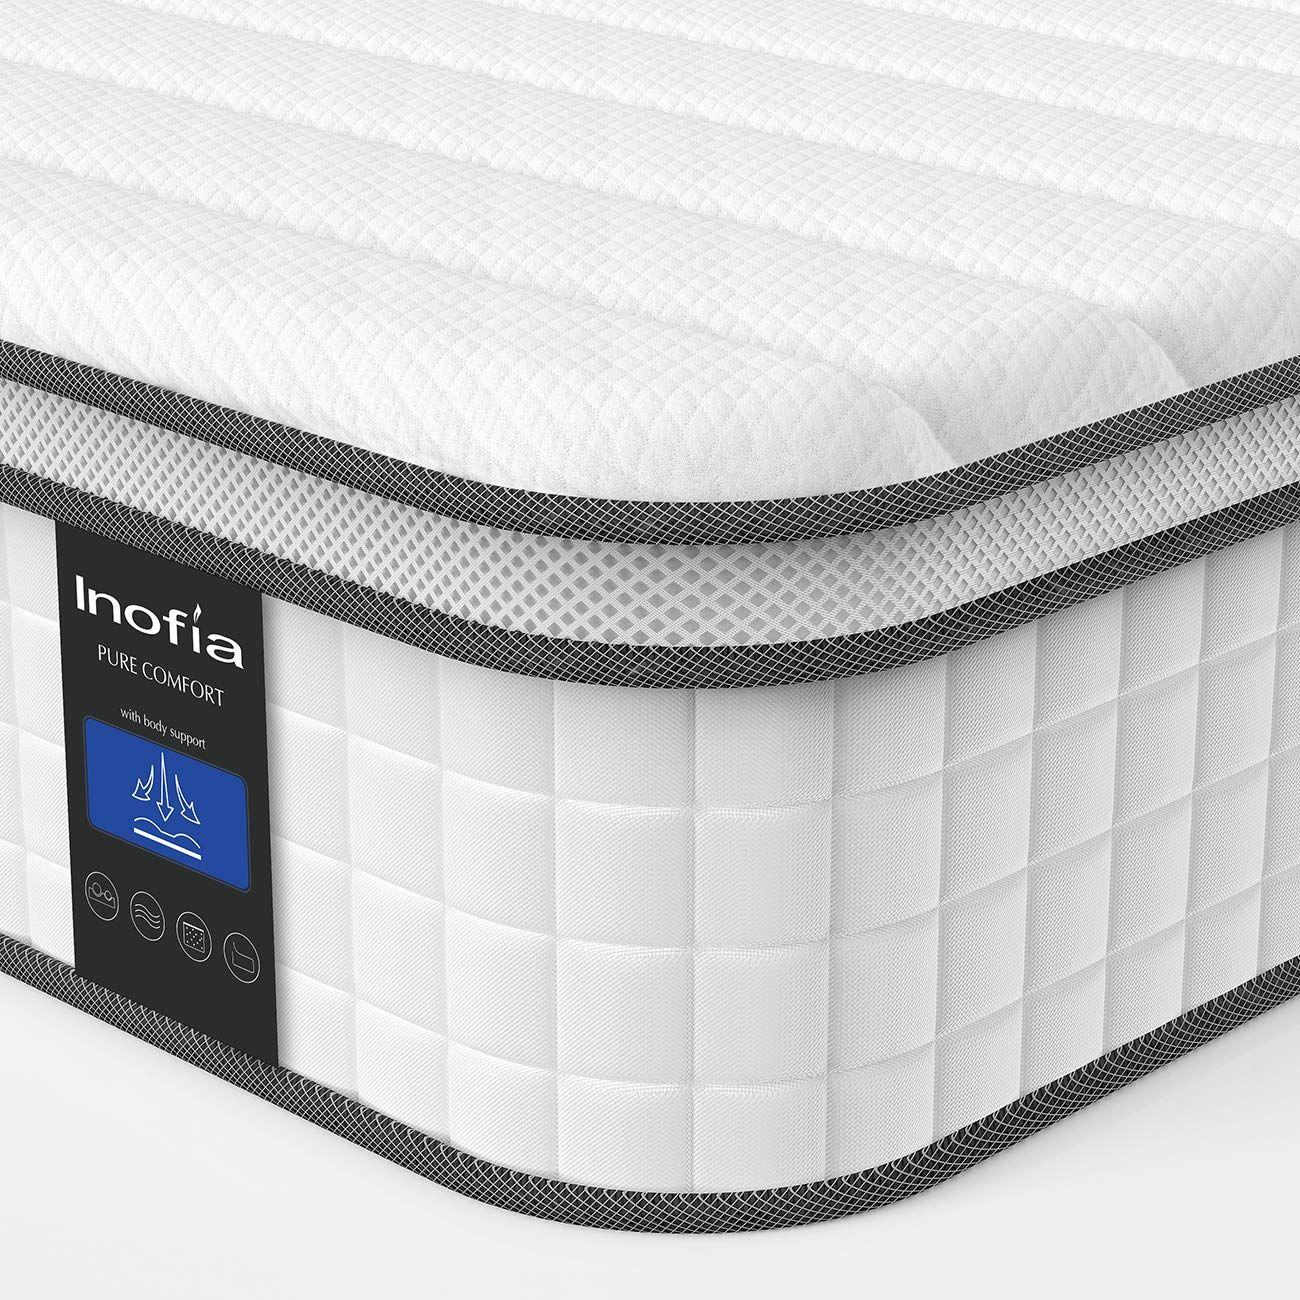 Inofia-Double-Memory-Foam-Sprung-Mattress-10.6-Inch